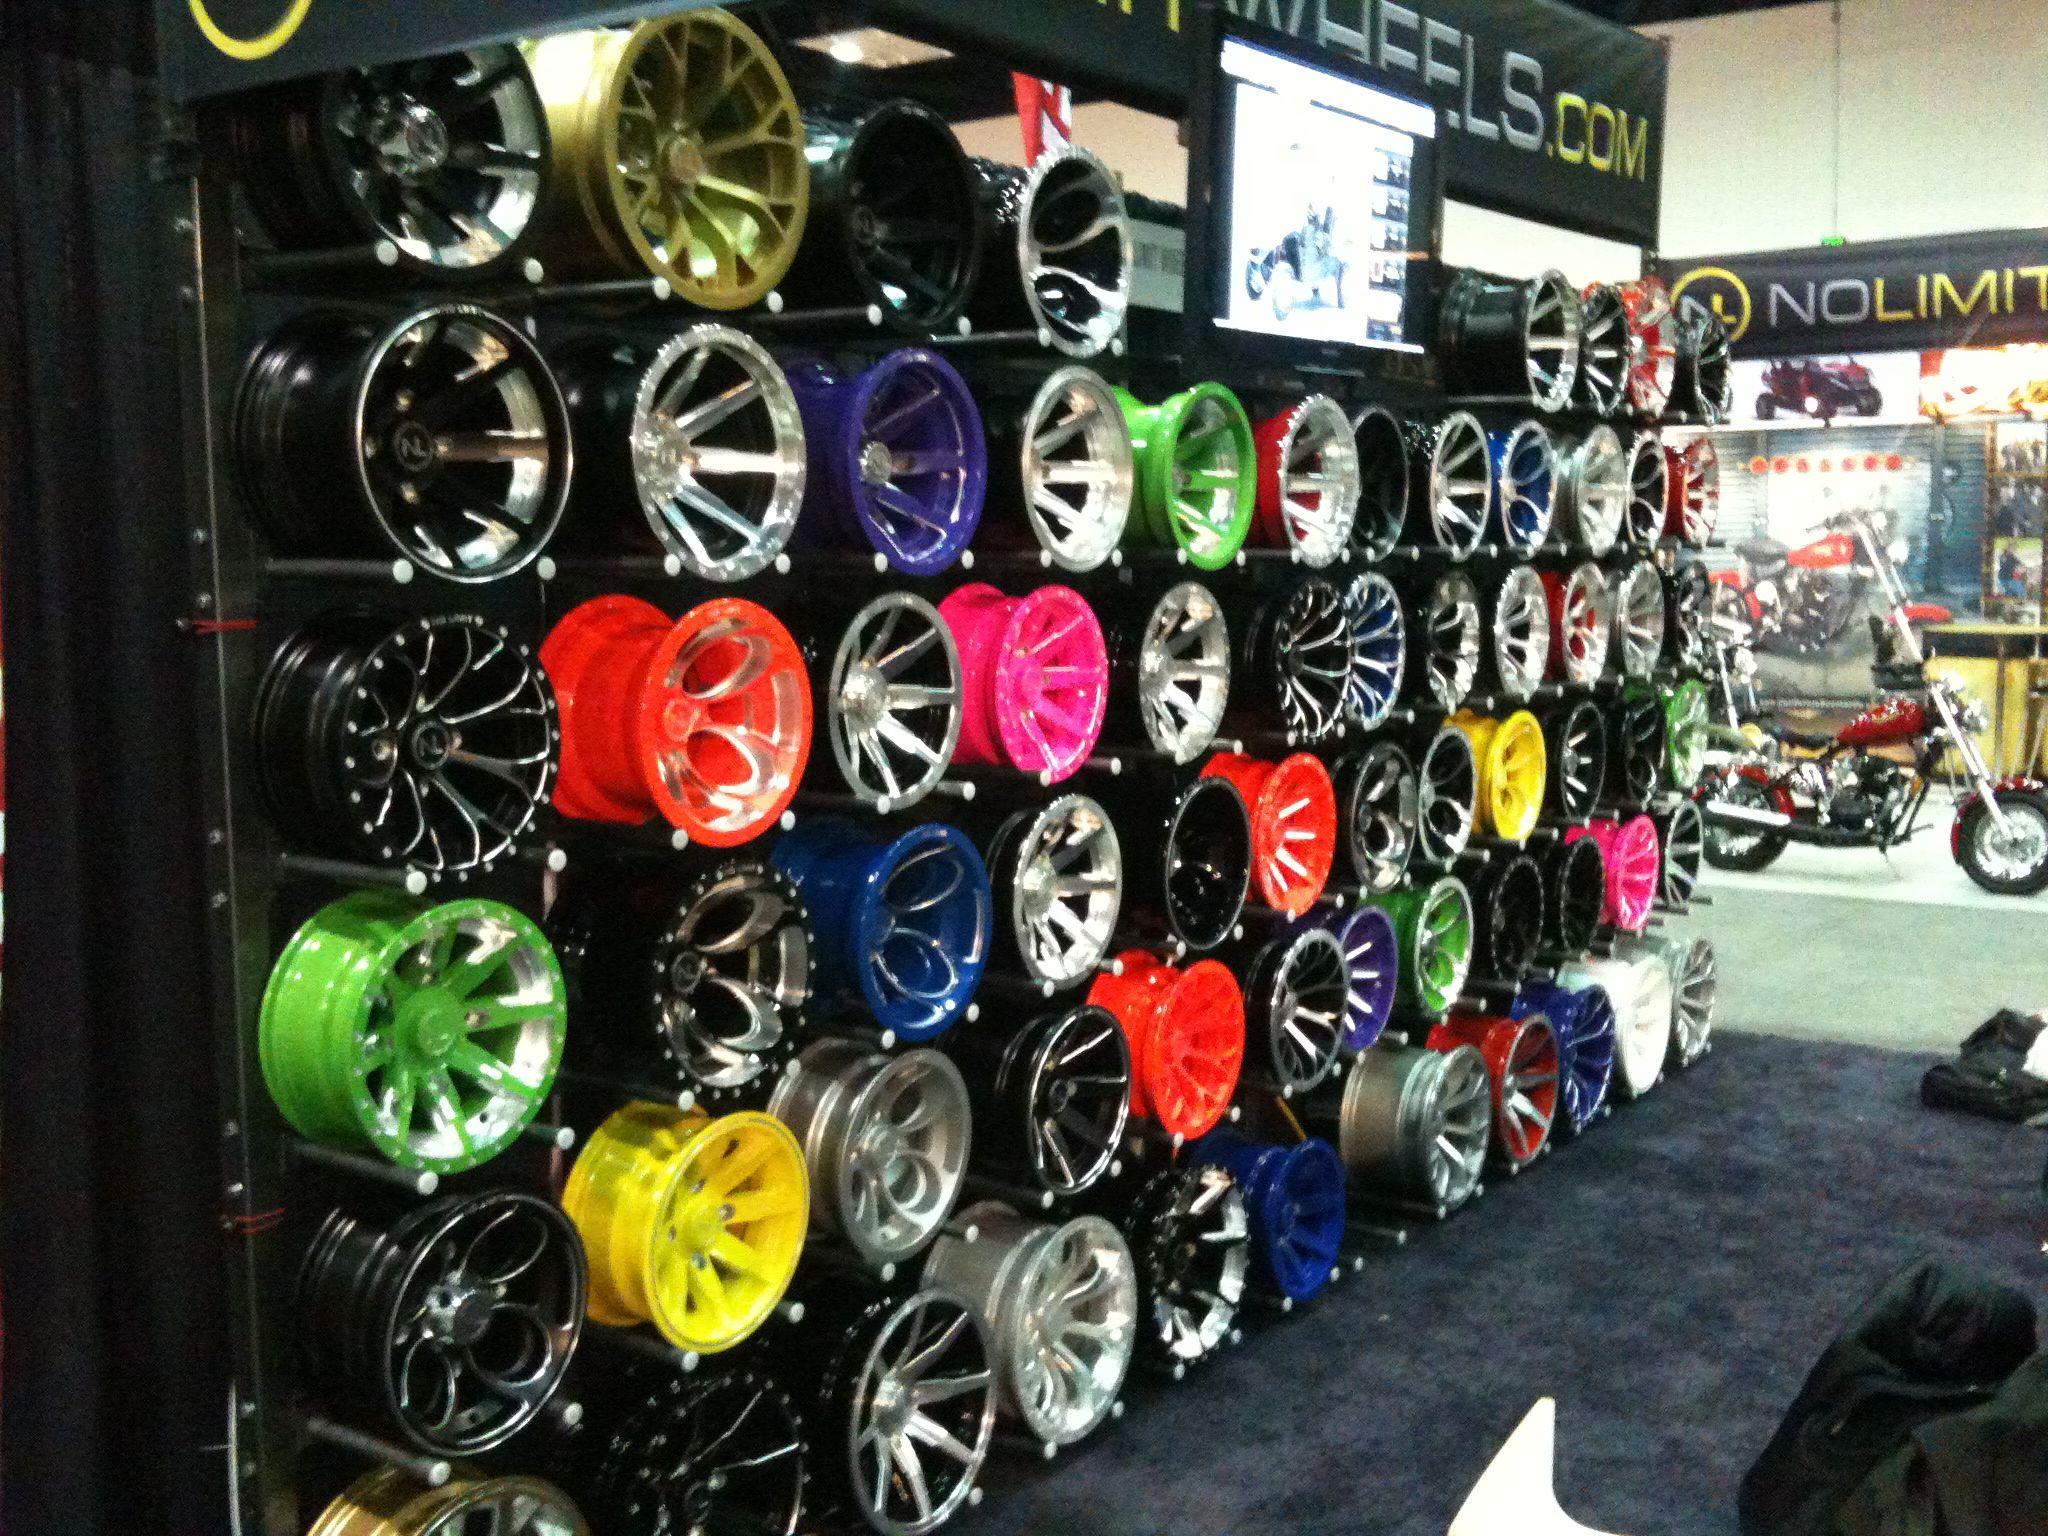 Dealer Expo 2011 - Wall of Wheels